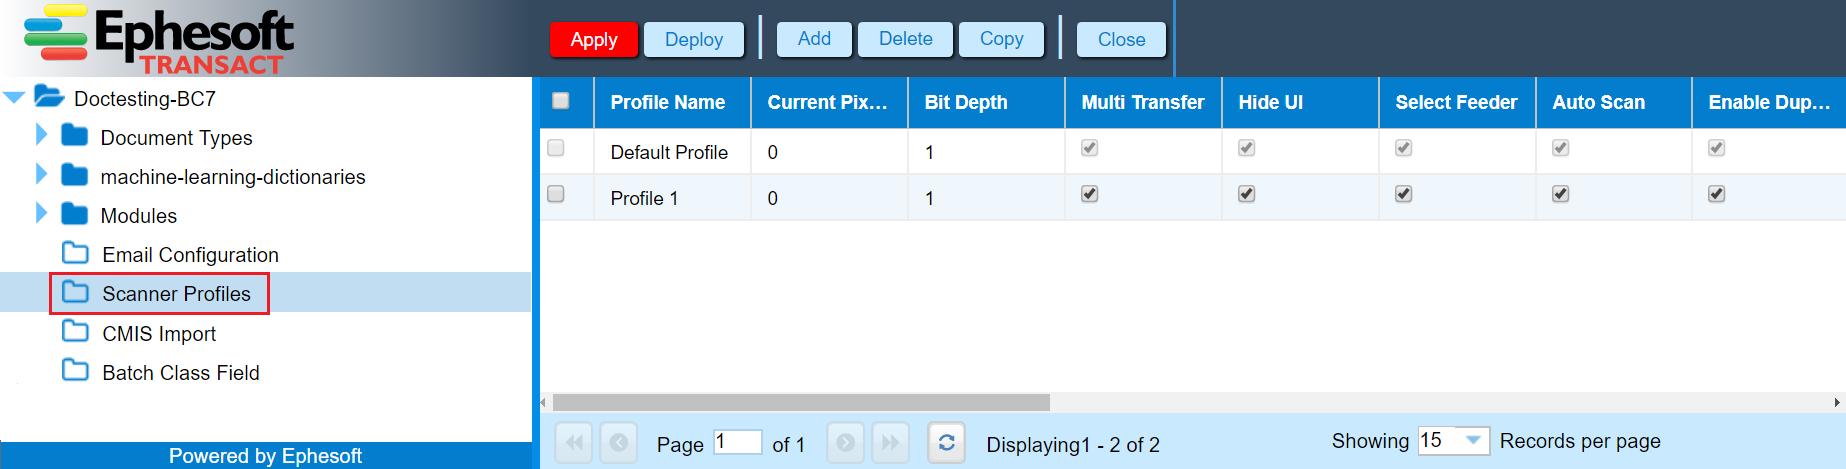 C:UsersEphesoftAppDataLocalMicrosoftWindowsINetCacheContent.Wordscanner profiles1.png